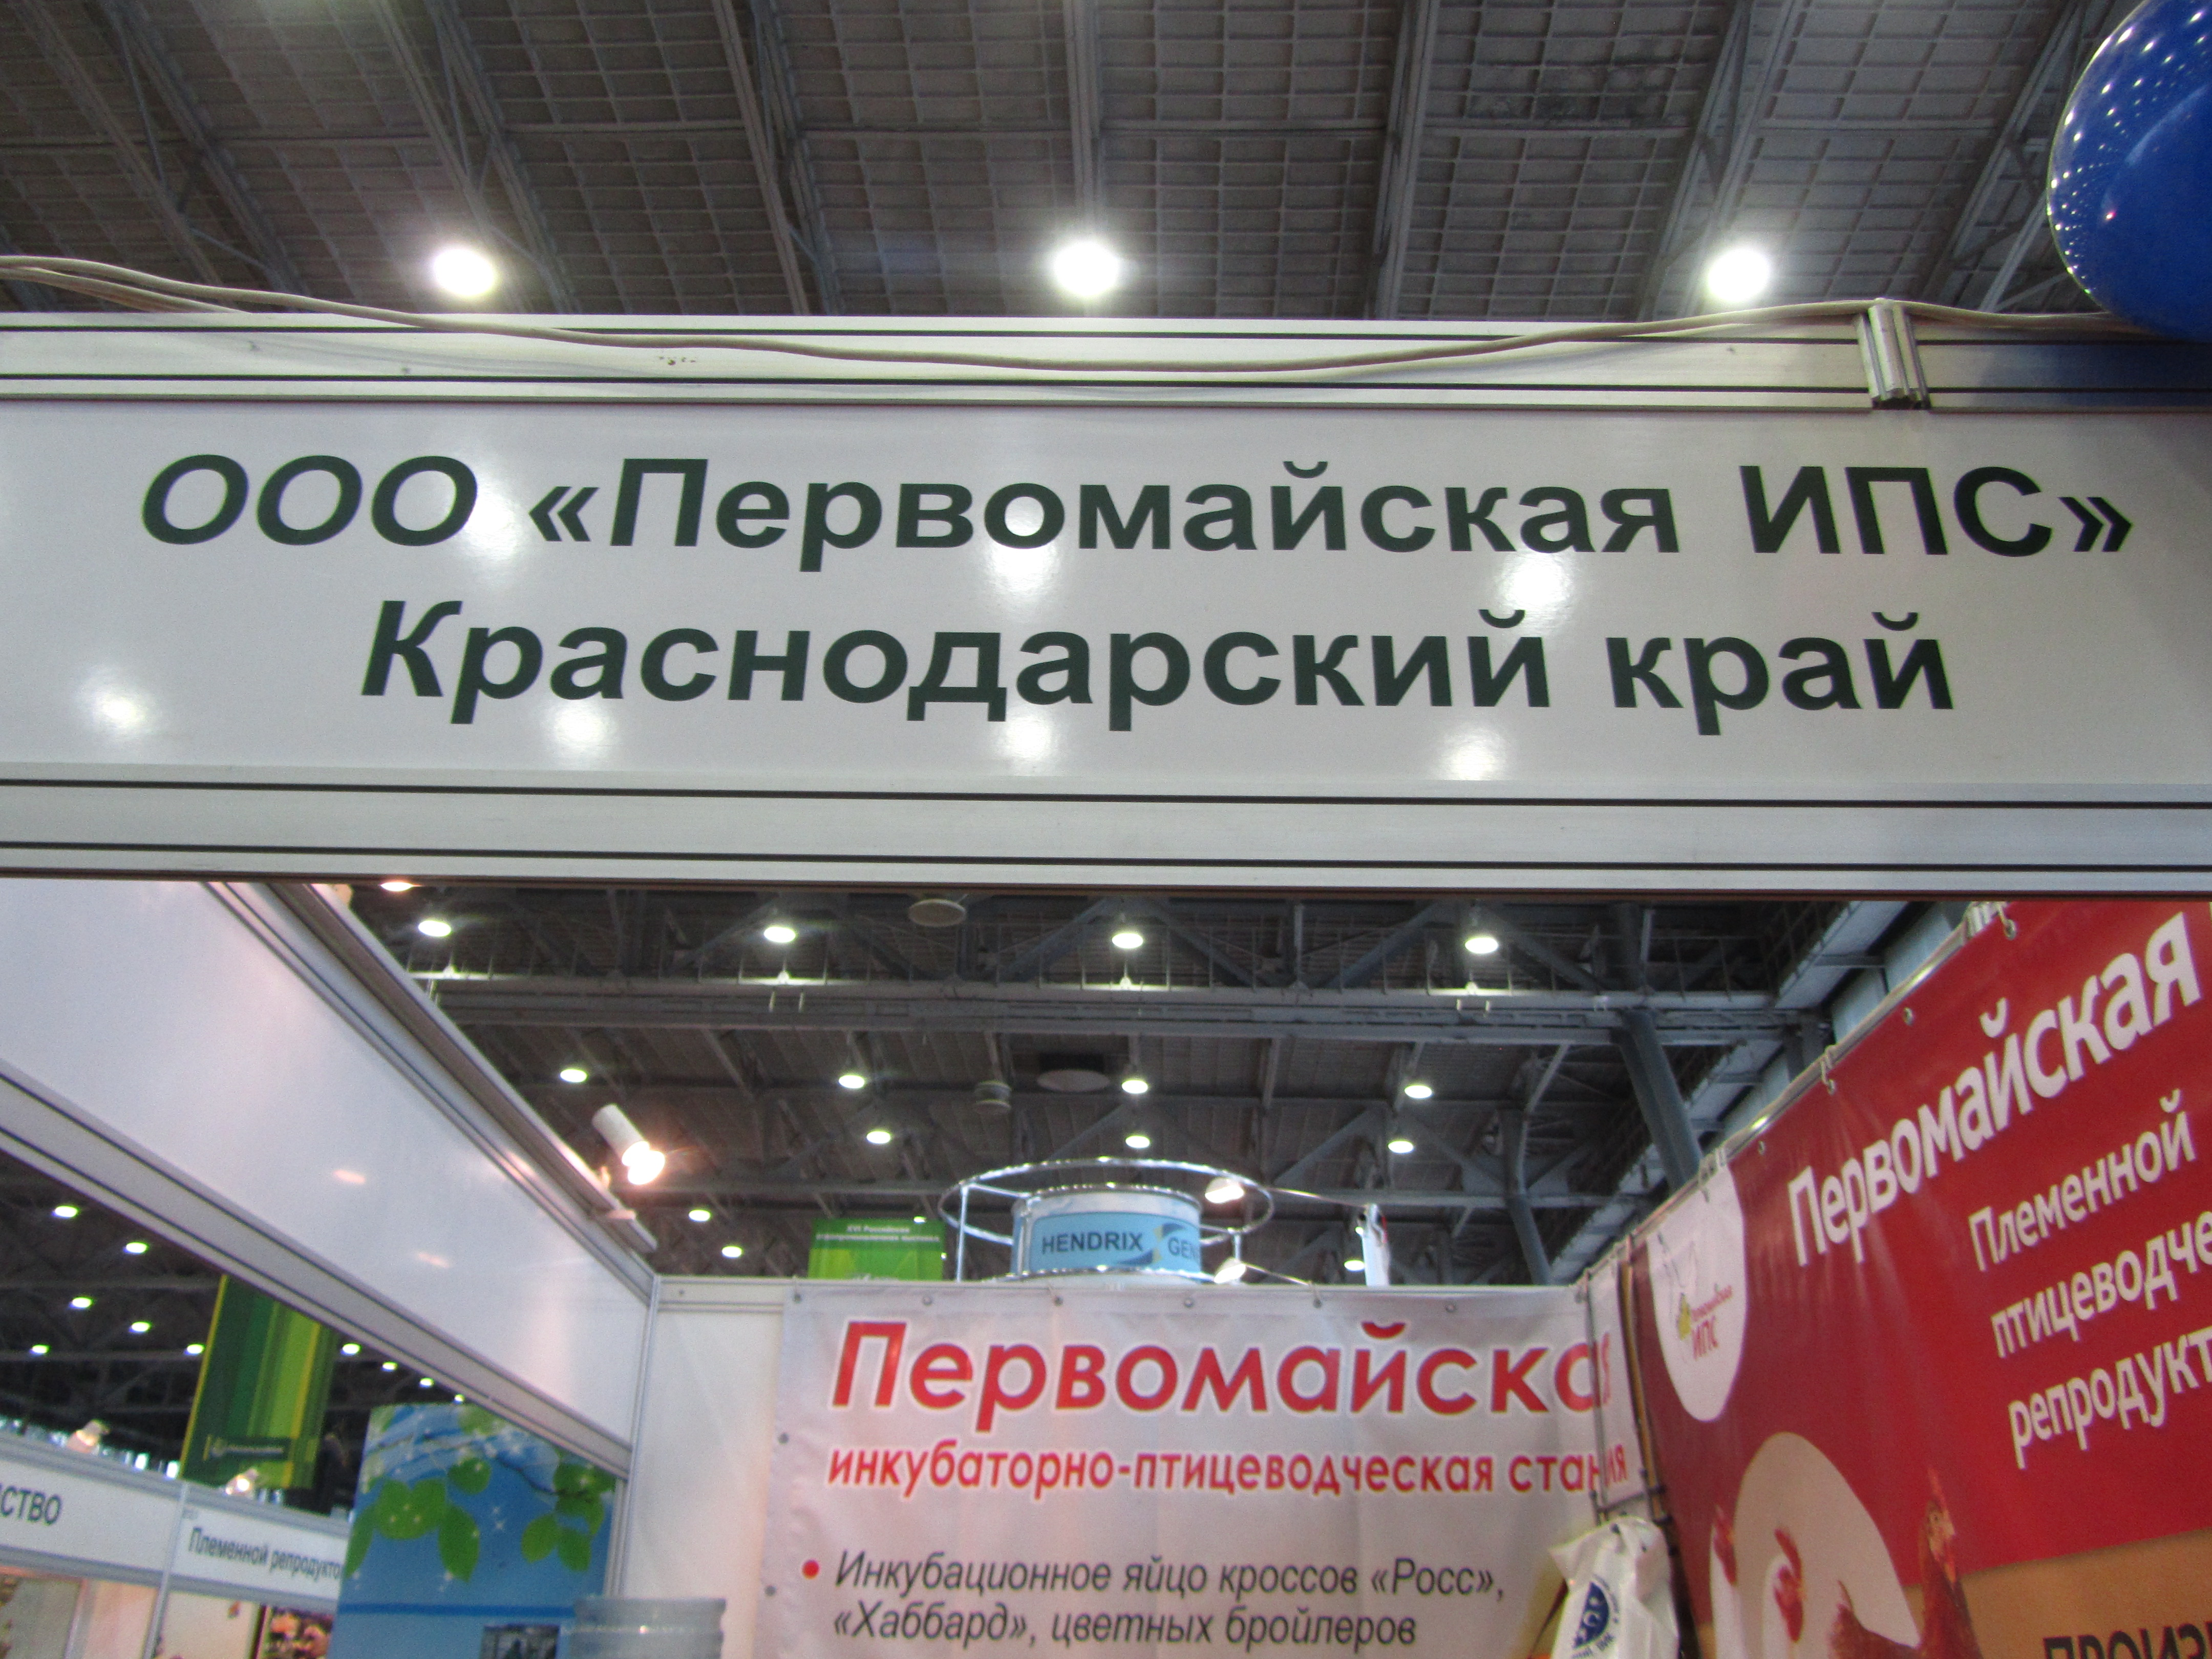 img6508.jpg